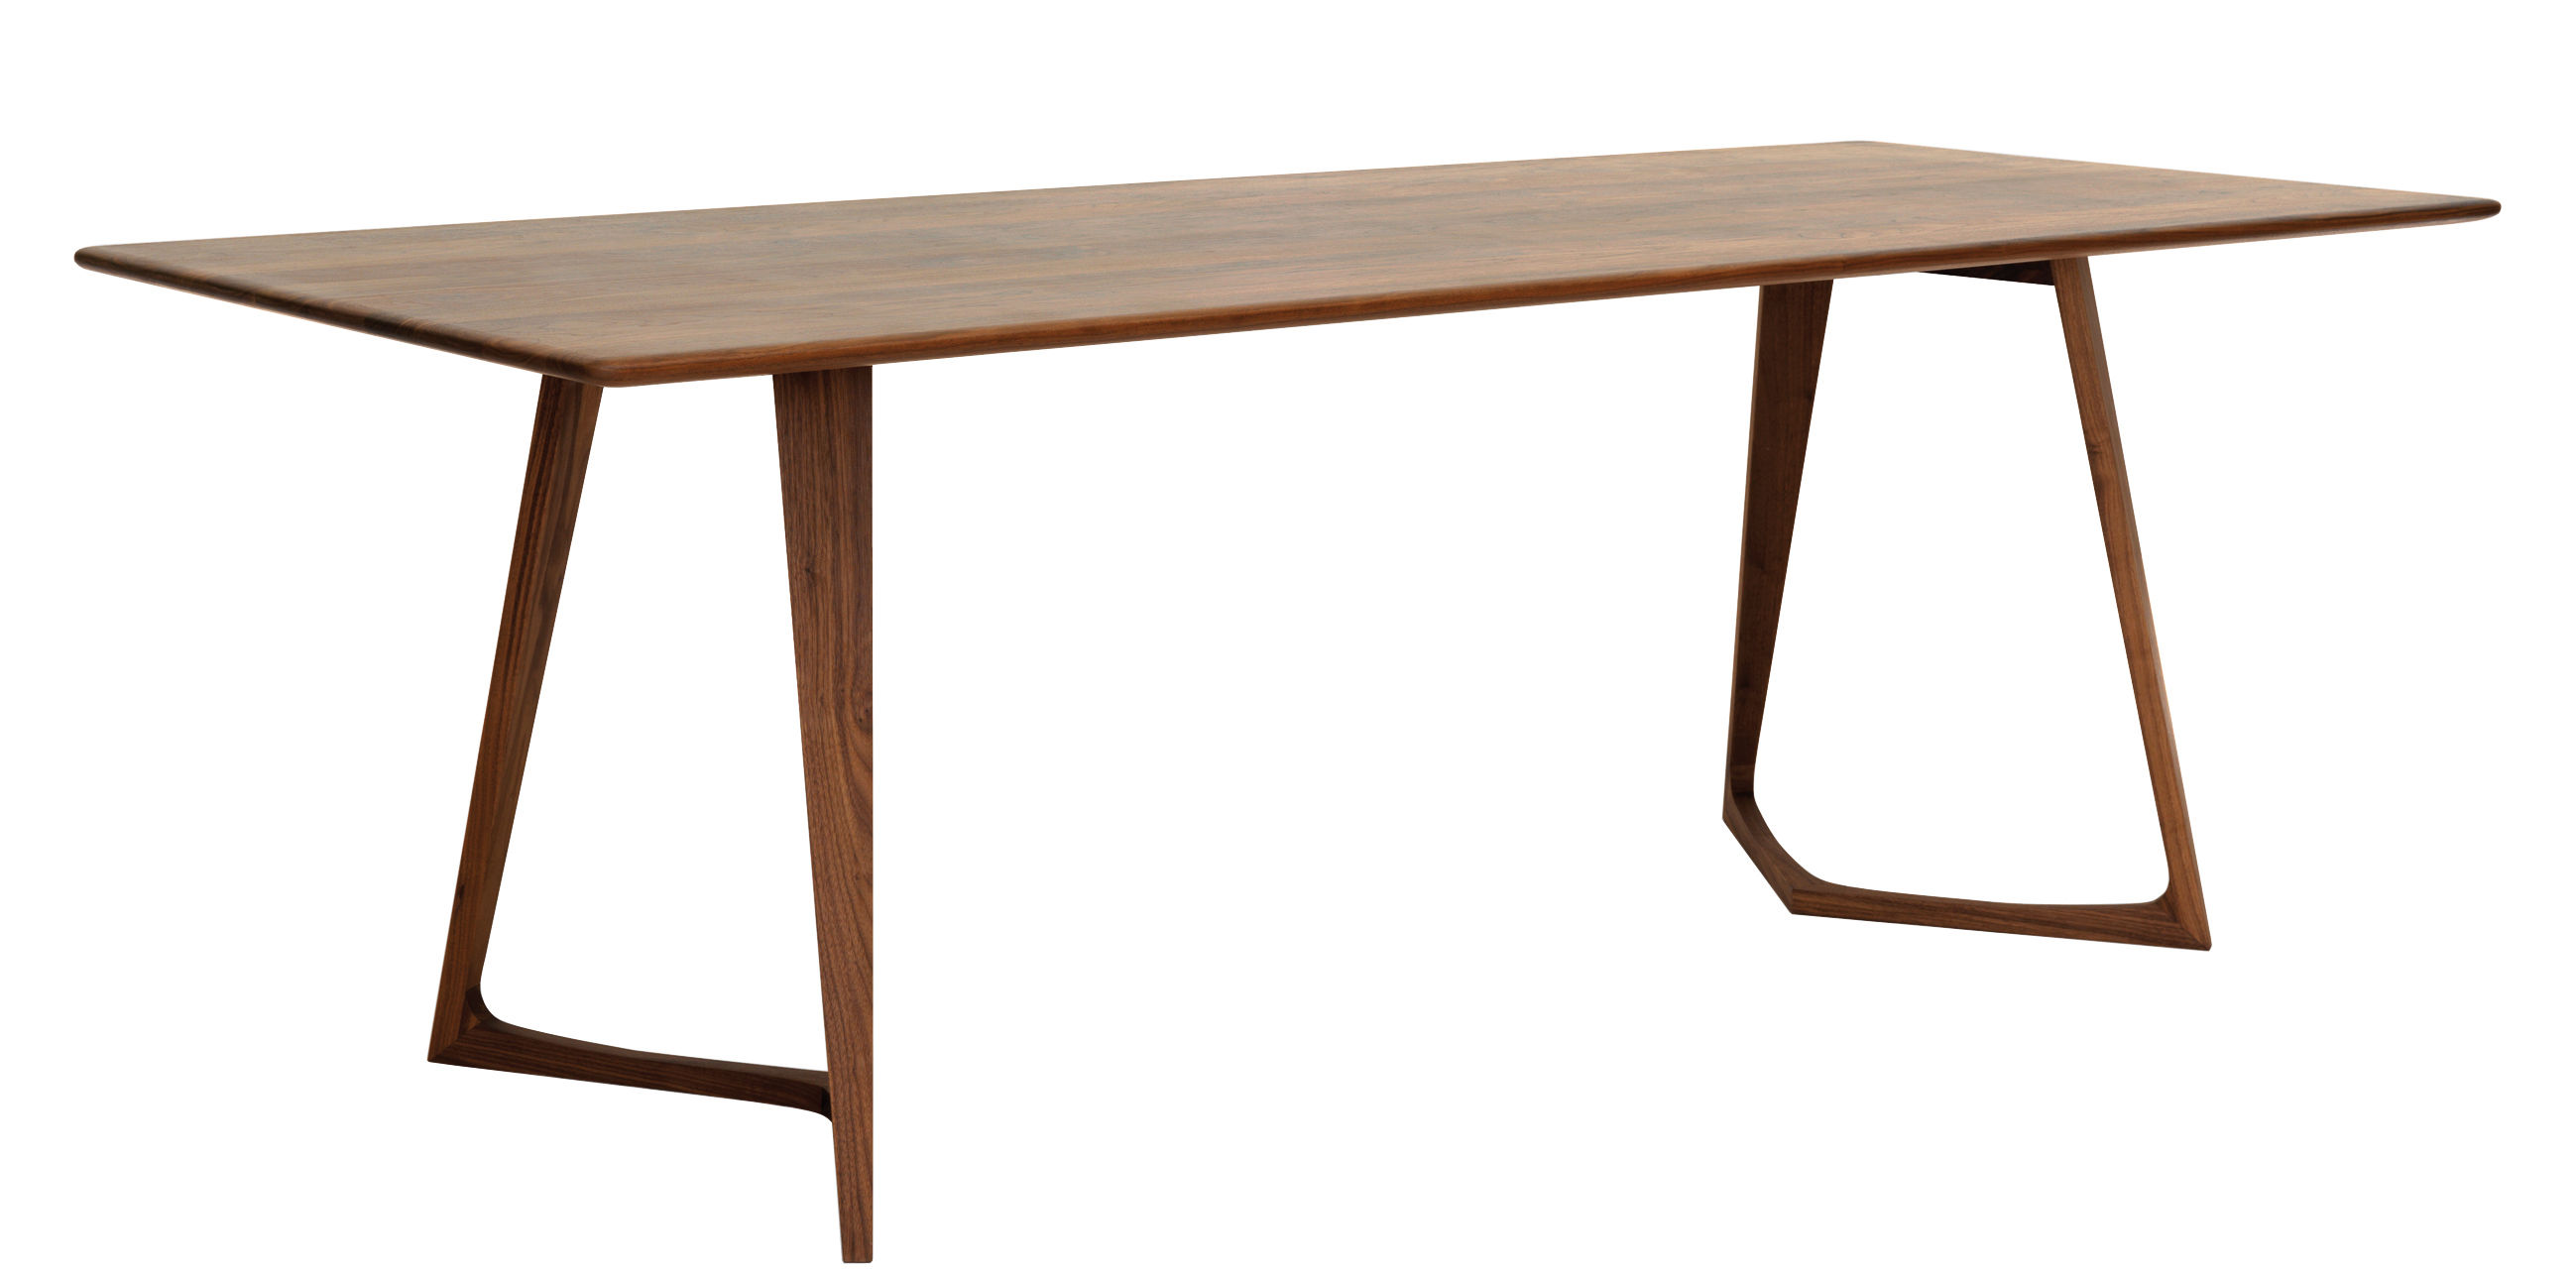 Mobilier - Tables - Table Twist / 200 x 90 cm - Zeitraum - 200 x 90 cm - Noyer - Noyer massif